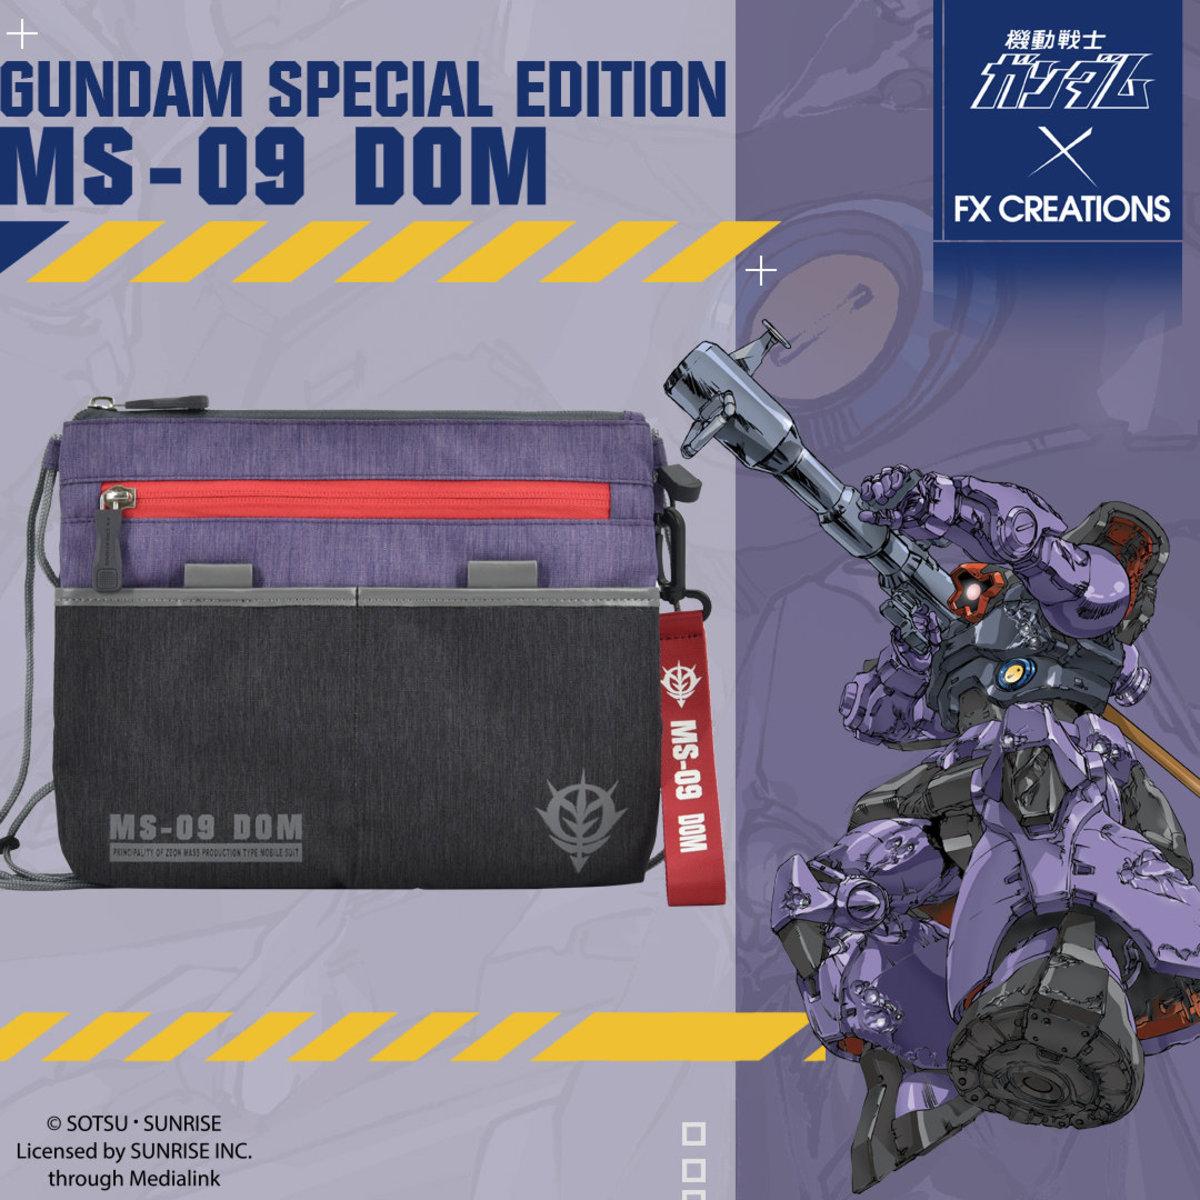 MS-09 Dom Crossbody bag